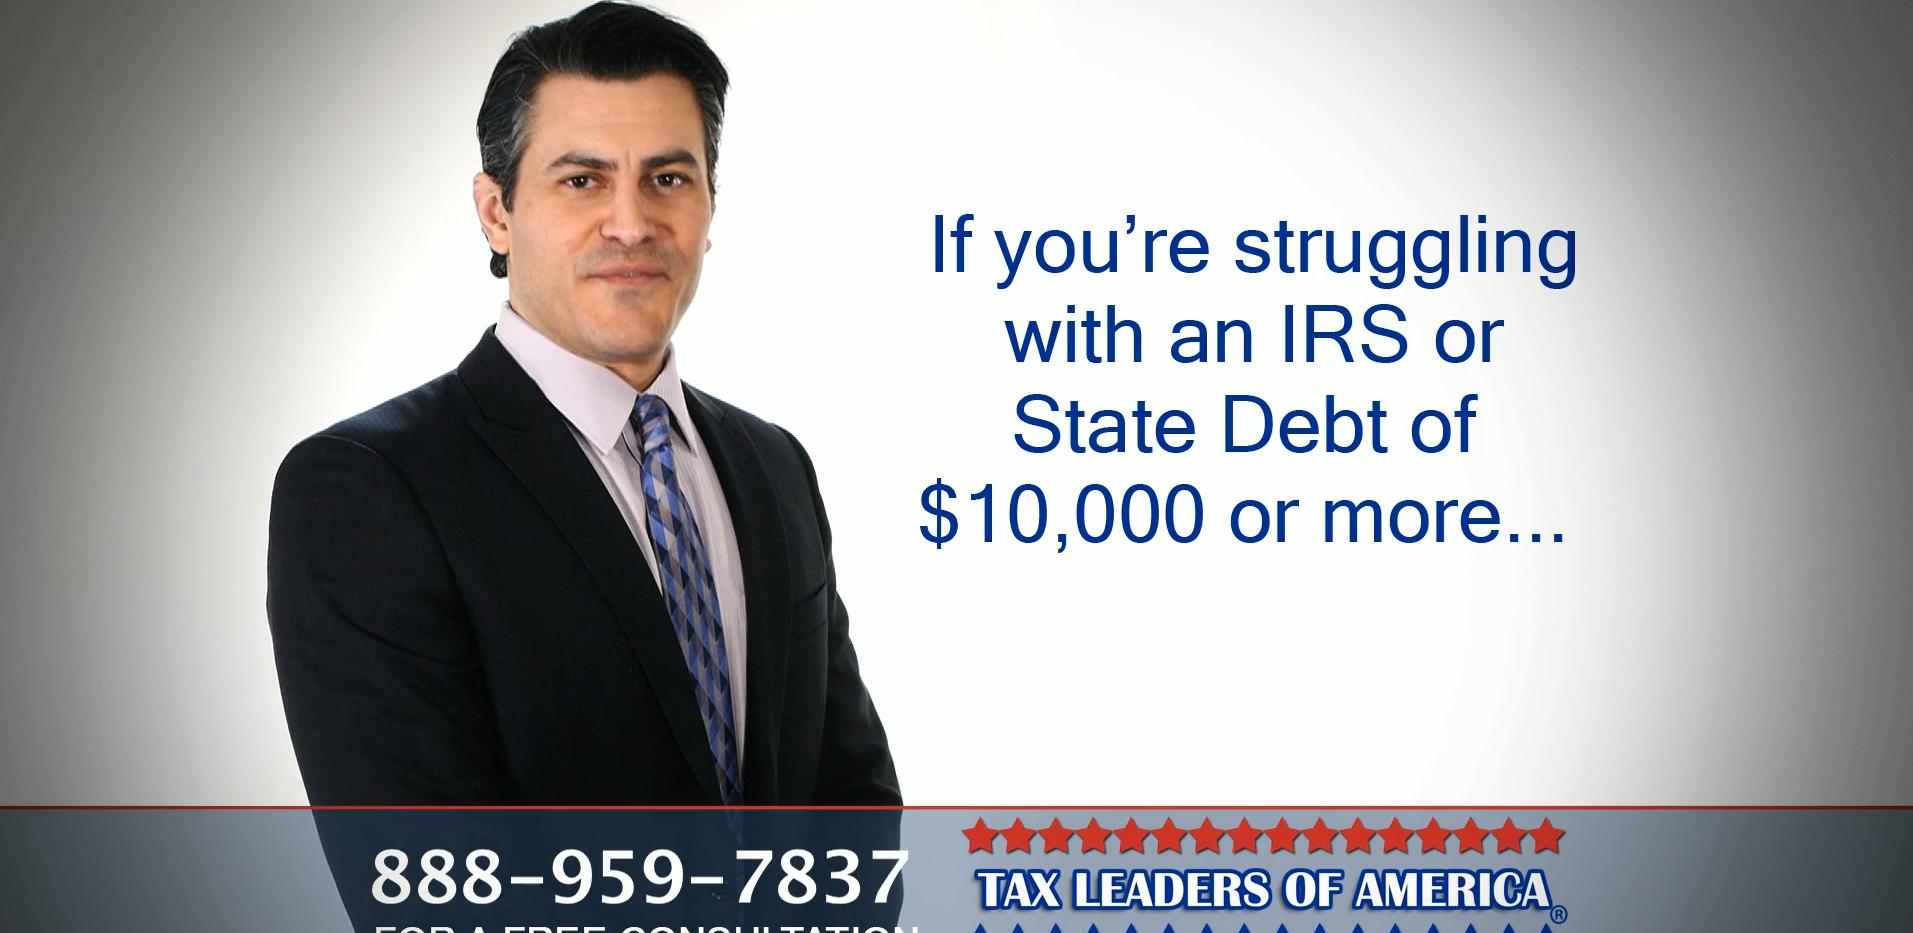 Tax Leaders of America